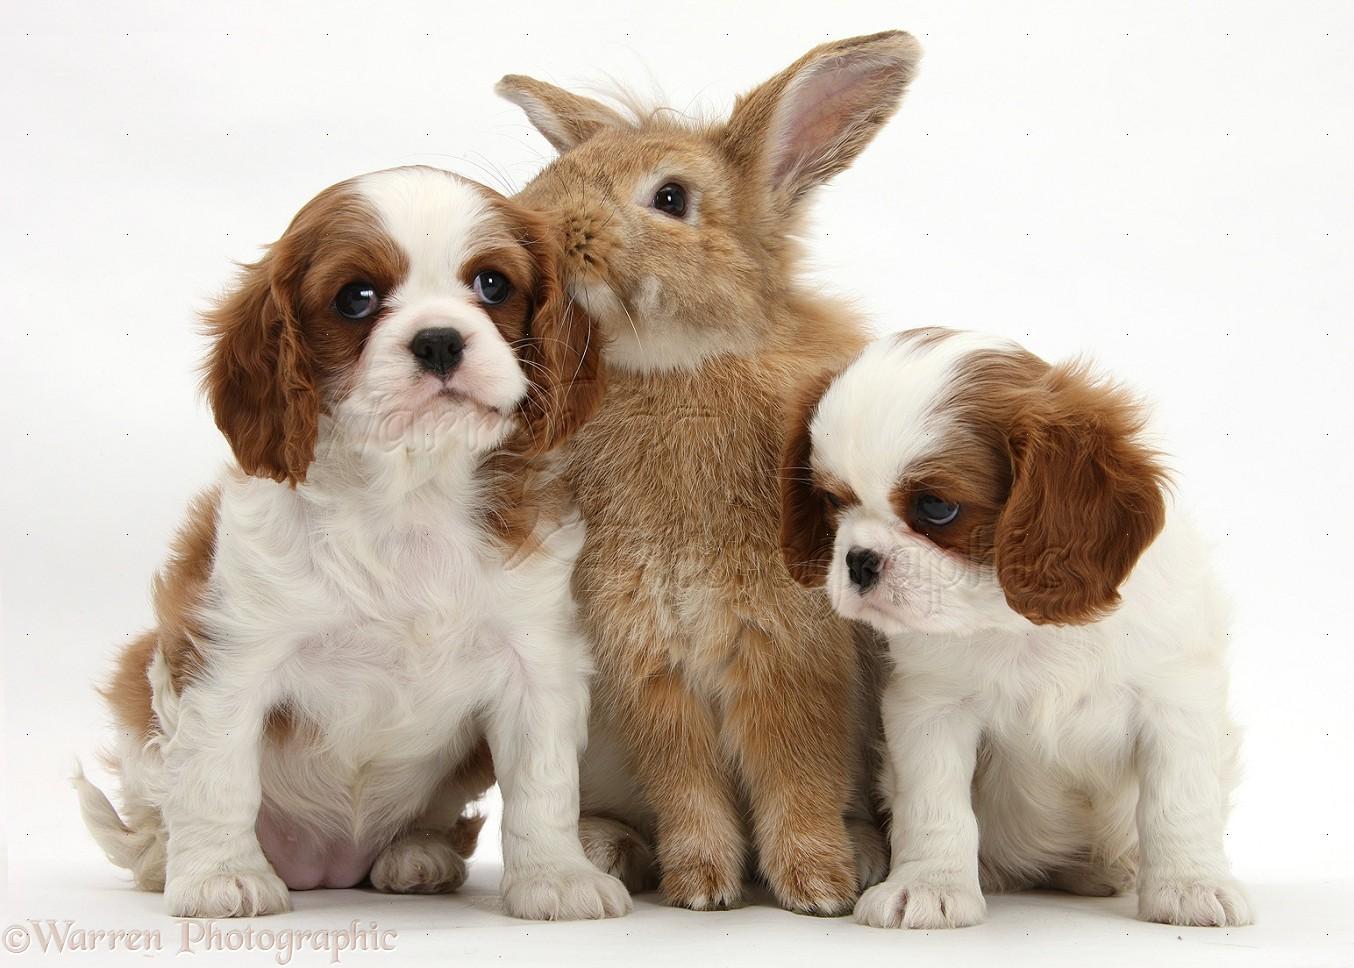 Pets cavalier king charles spaniel pups and rabbit photo wp28454 blenheim cavalier king charles spaniel pups with sandy lionhead rabbit white background altavistaventures Gallery